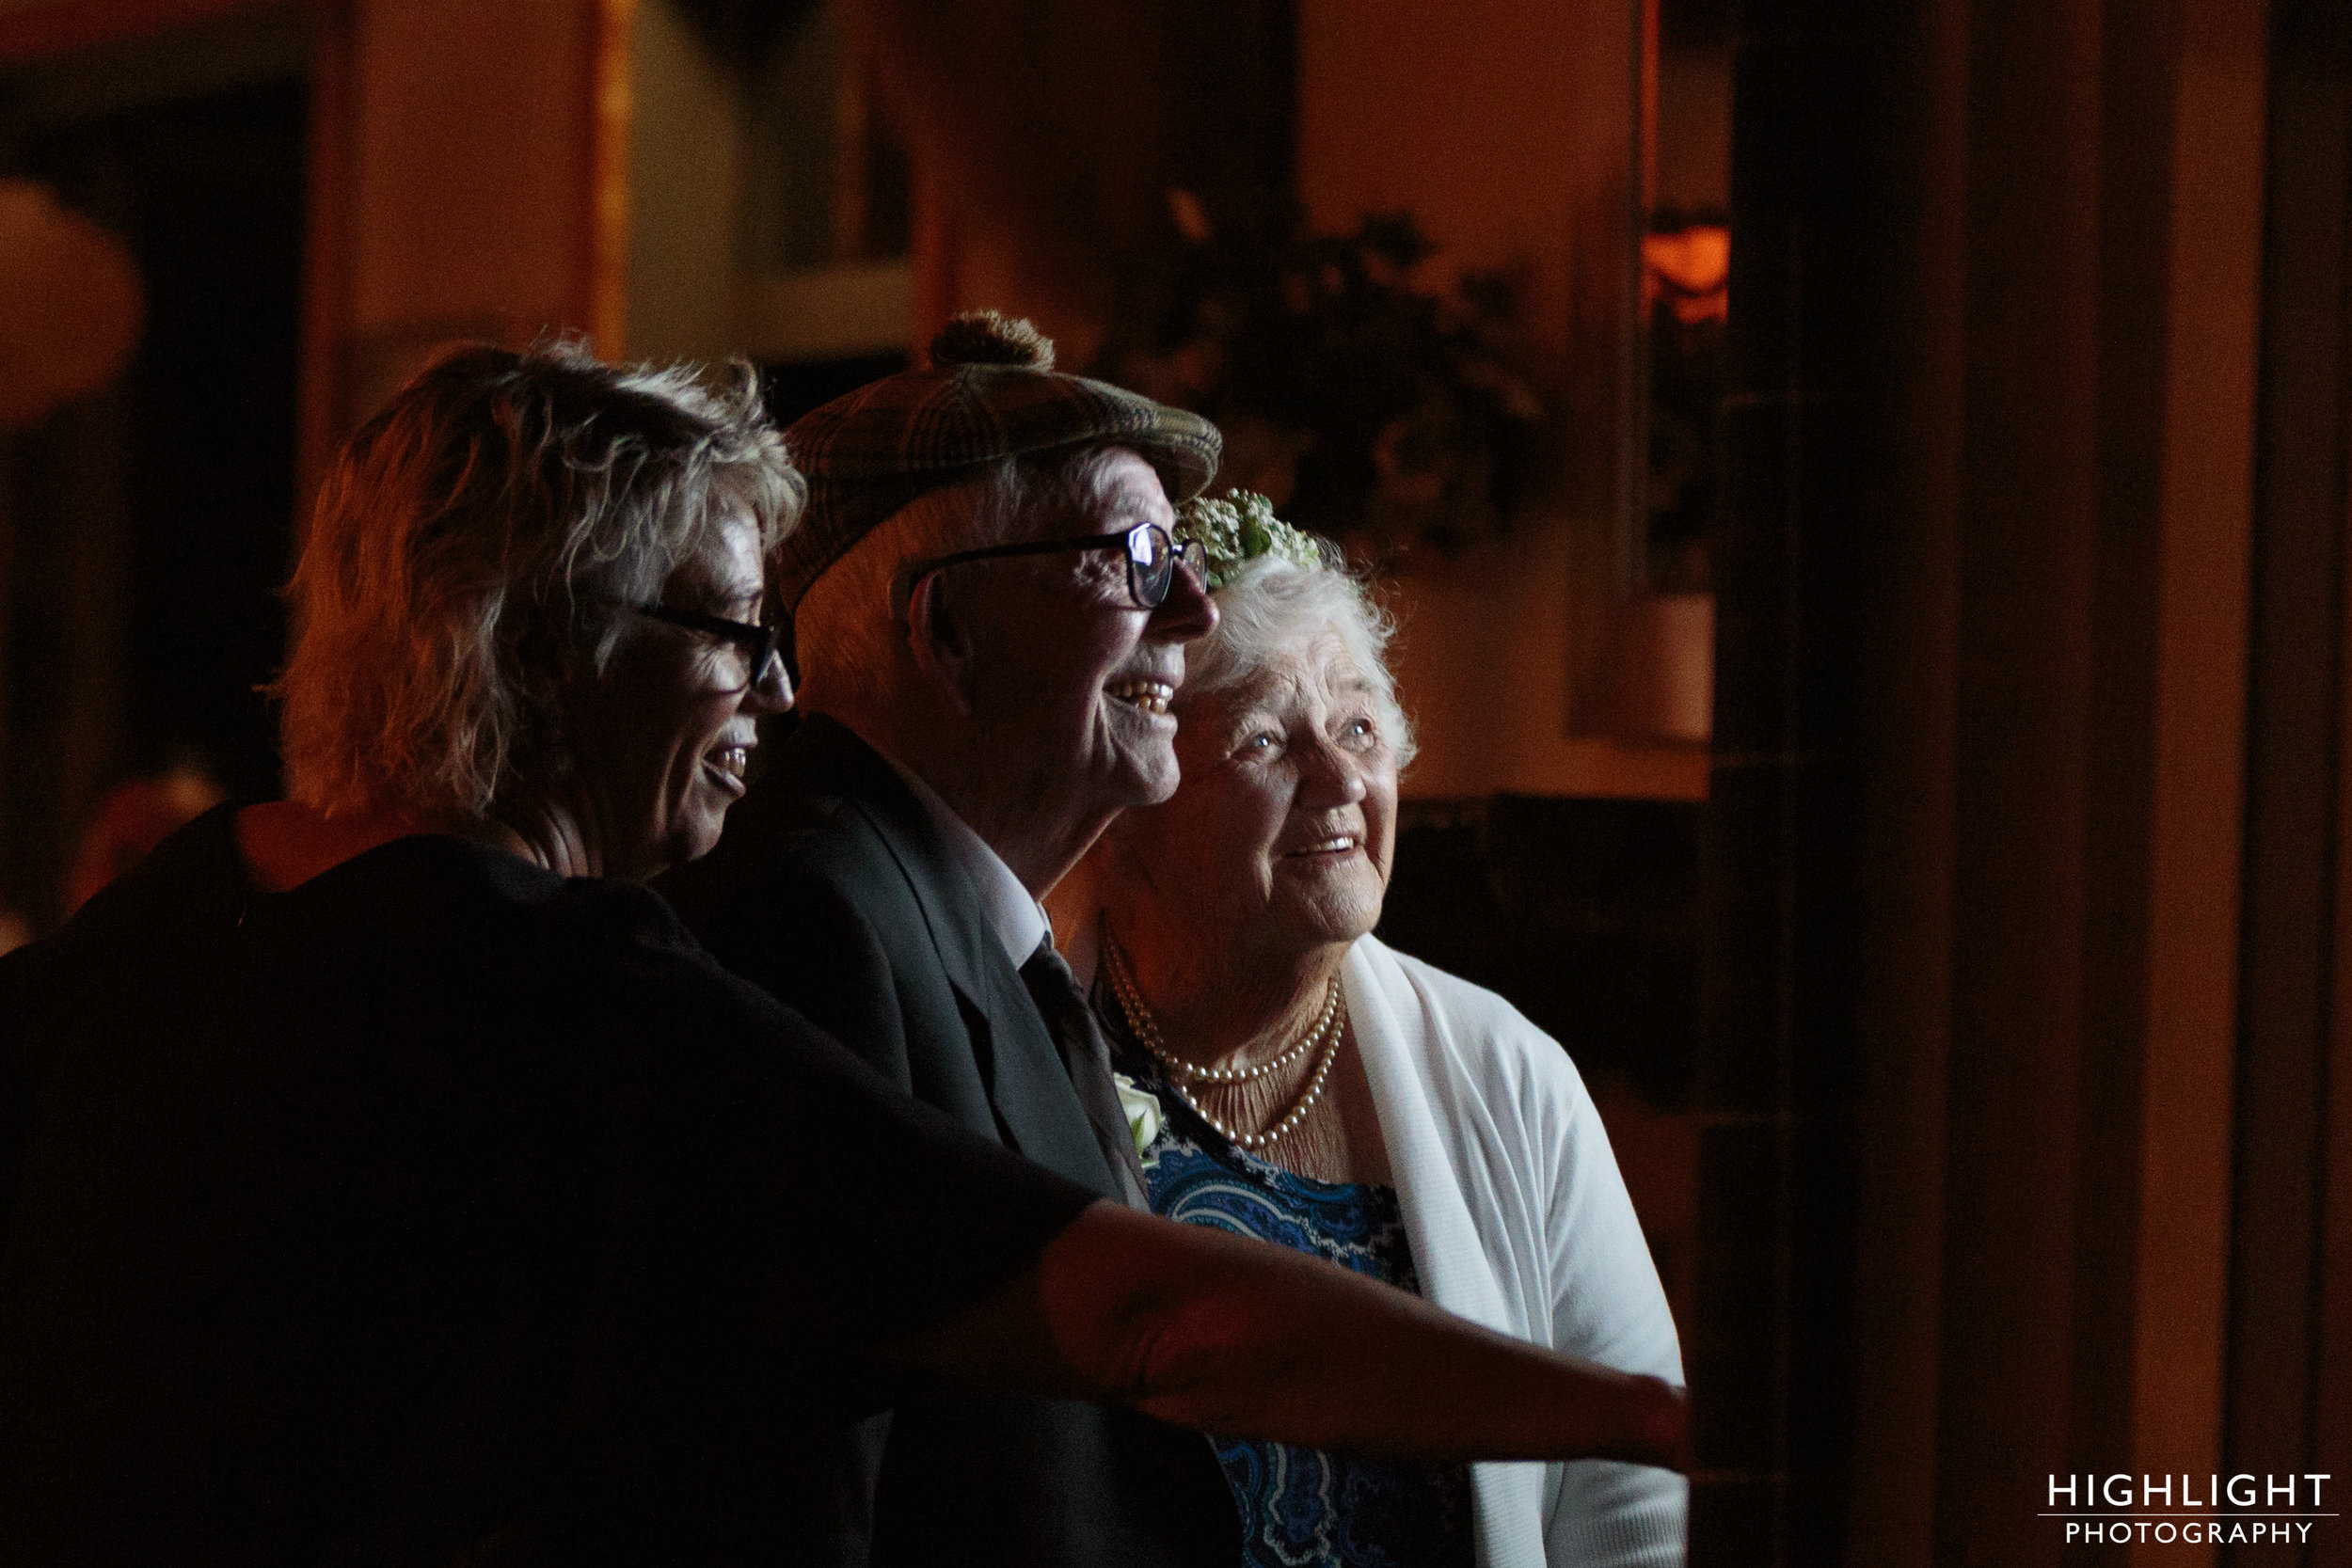 highlight-wedding-photography-new-zealand-makoura-lodge-wedding-195.jpg